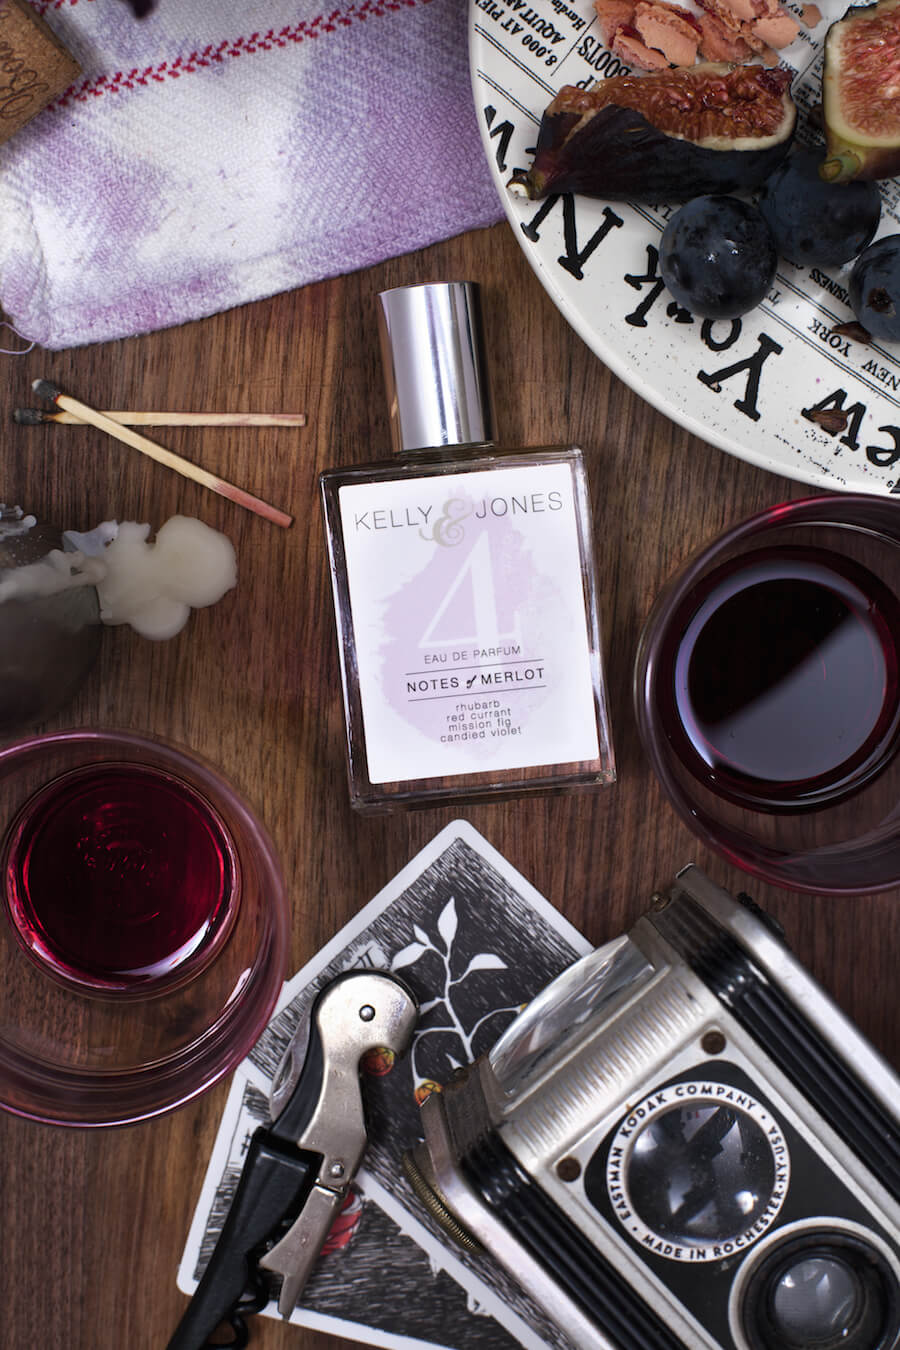 Kelly Jones perfume NYC